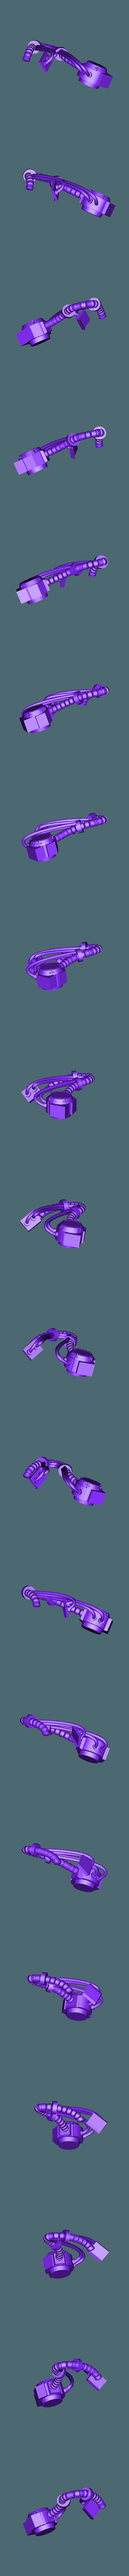 Aggressor_1_Right_hoses.stl Download free STL file Flame Armed Instigators • 3D printable template, danny_cyanide